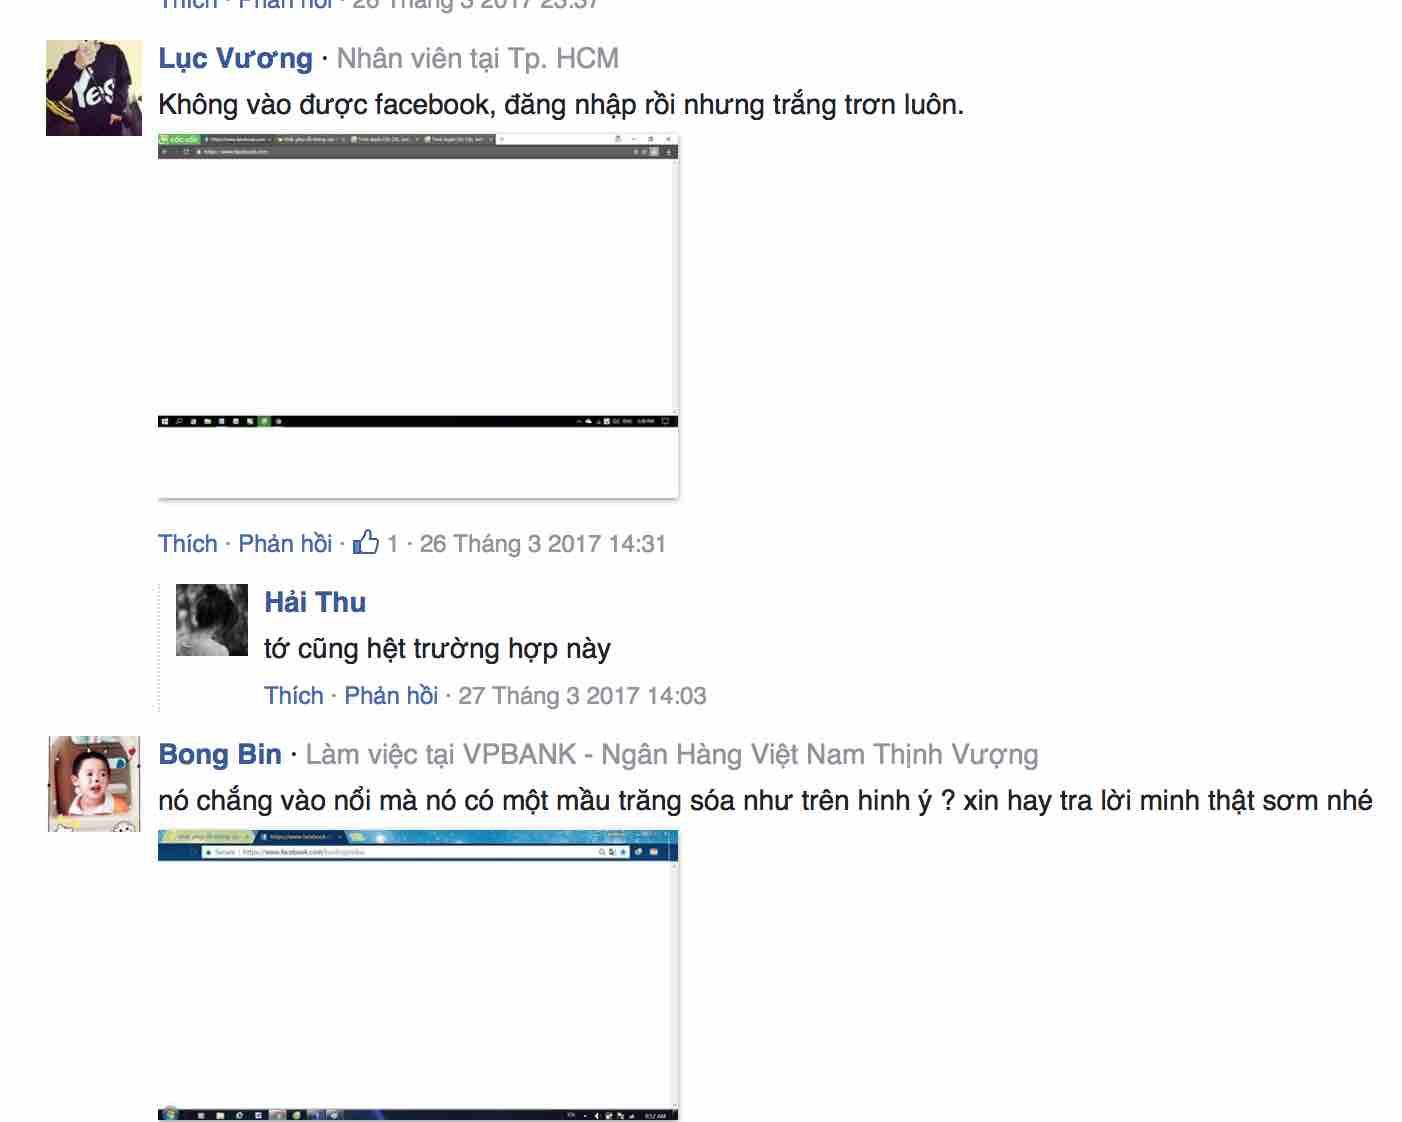 binh luan facebook hinh anh 2